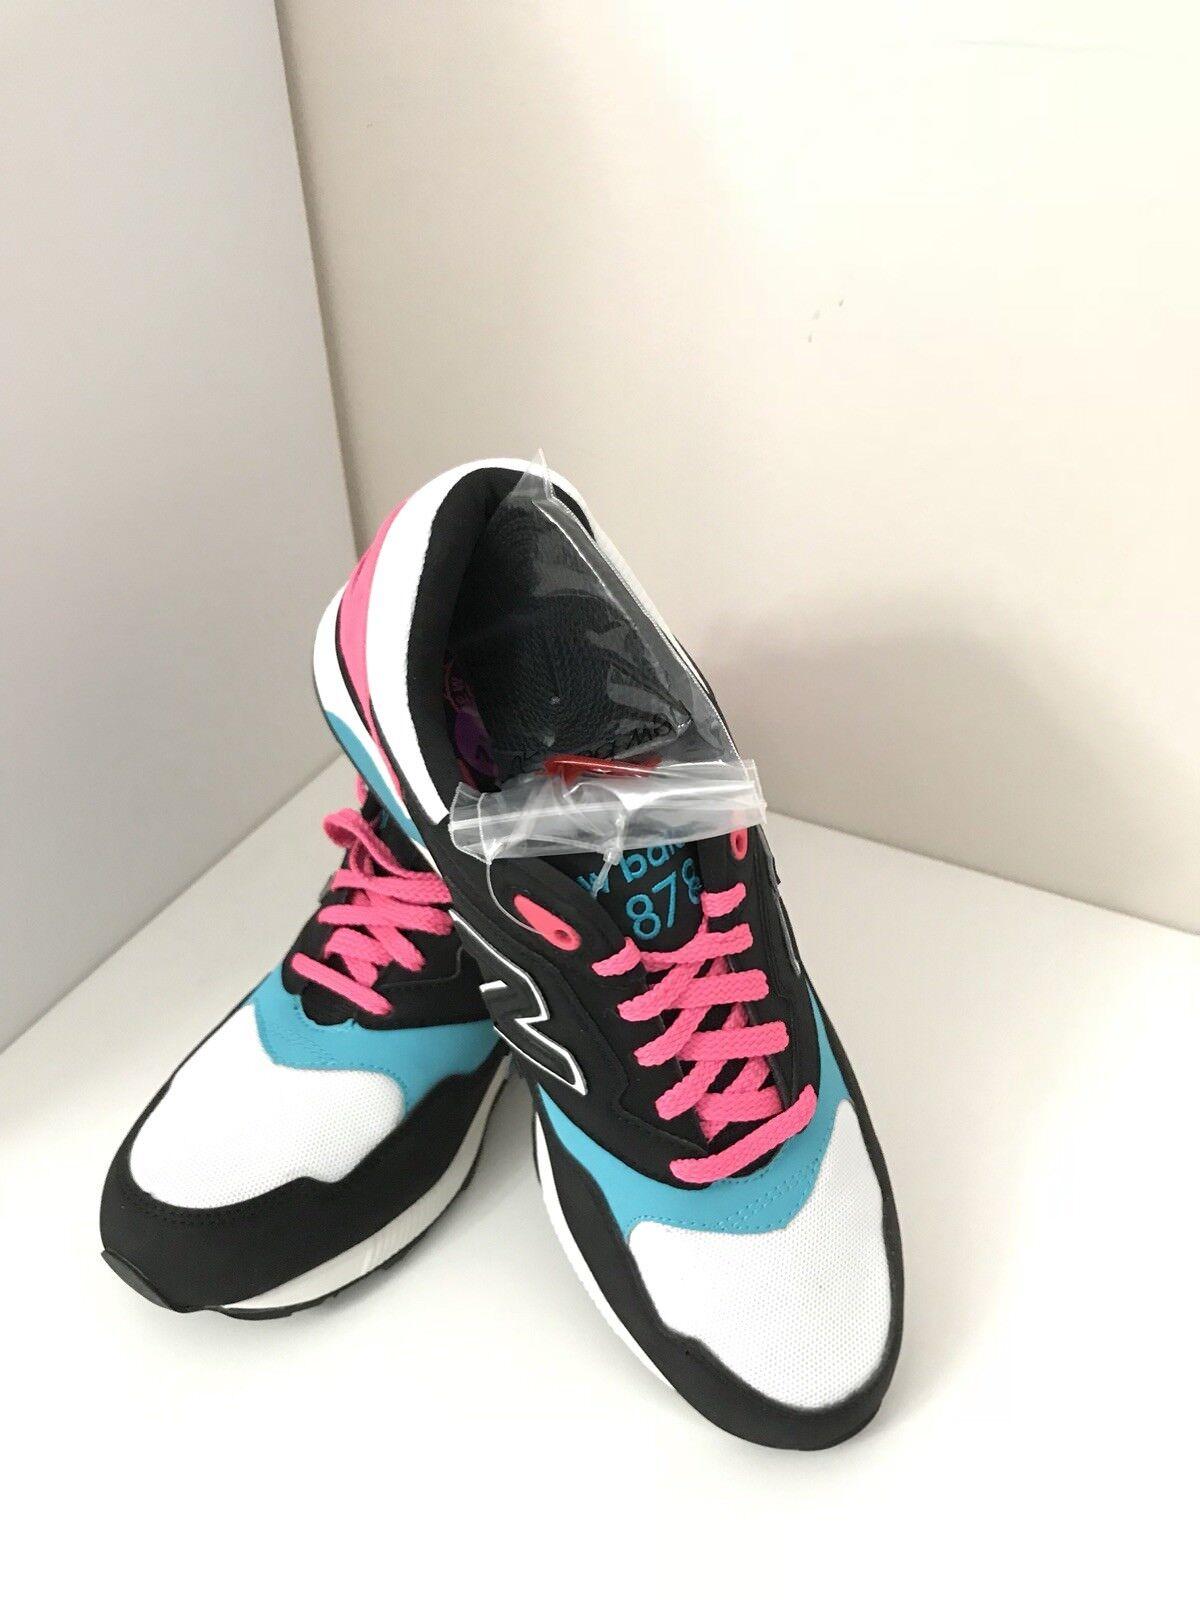 New Balance 878 ML878RSD RUNNING Men's SZ 8.5 Black Pink Teal